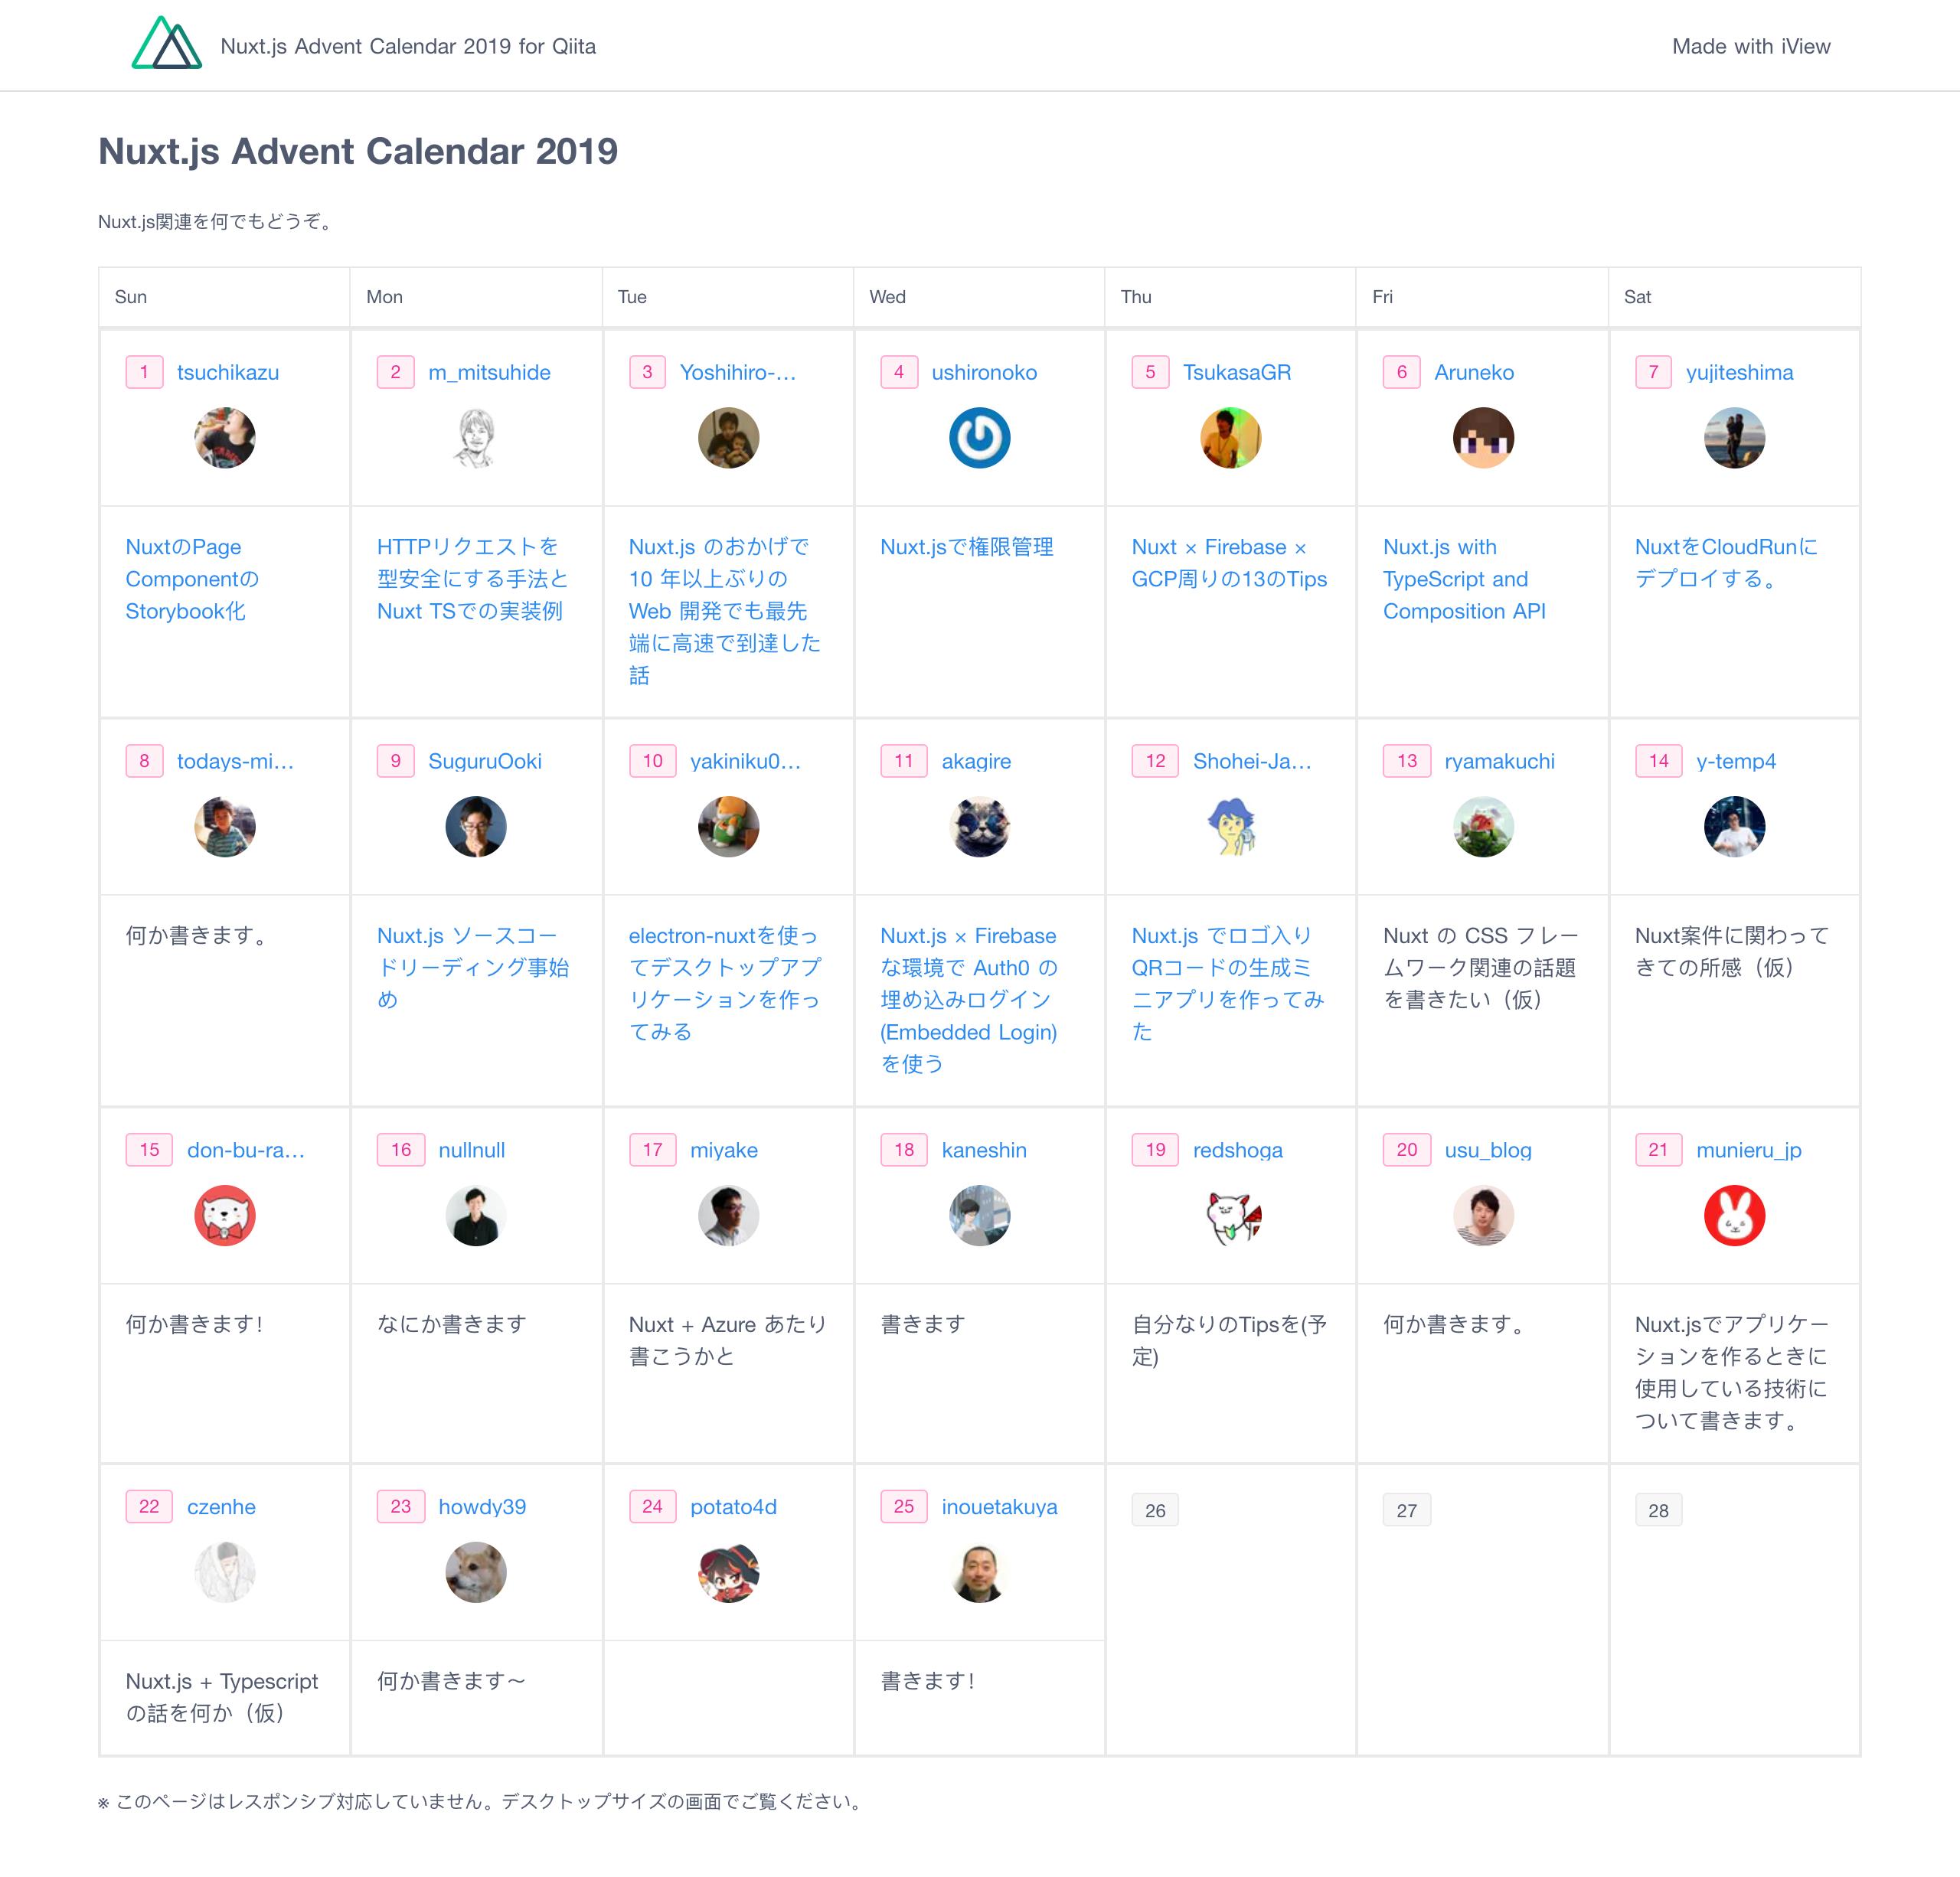 advent-calendar-2019-iview.netlify.com.png